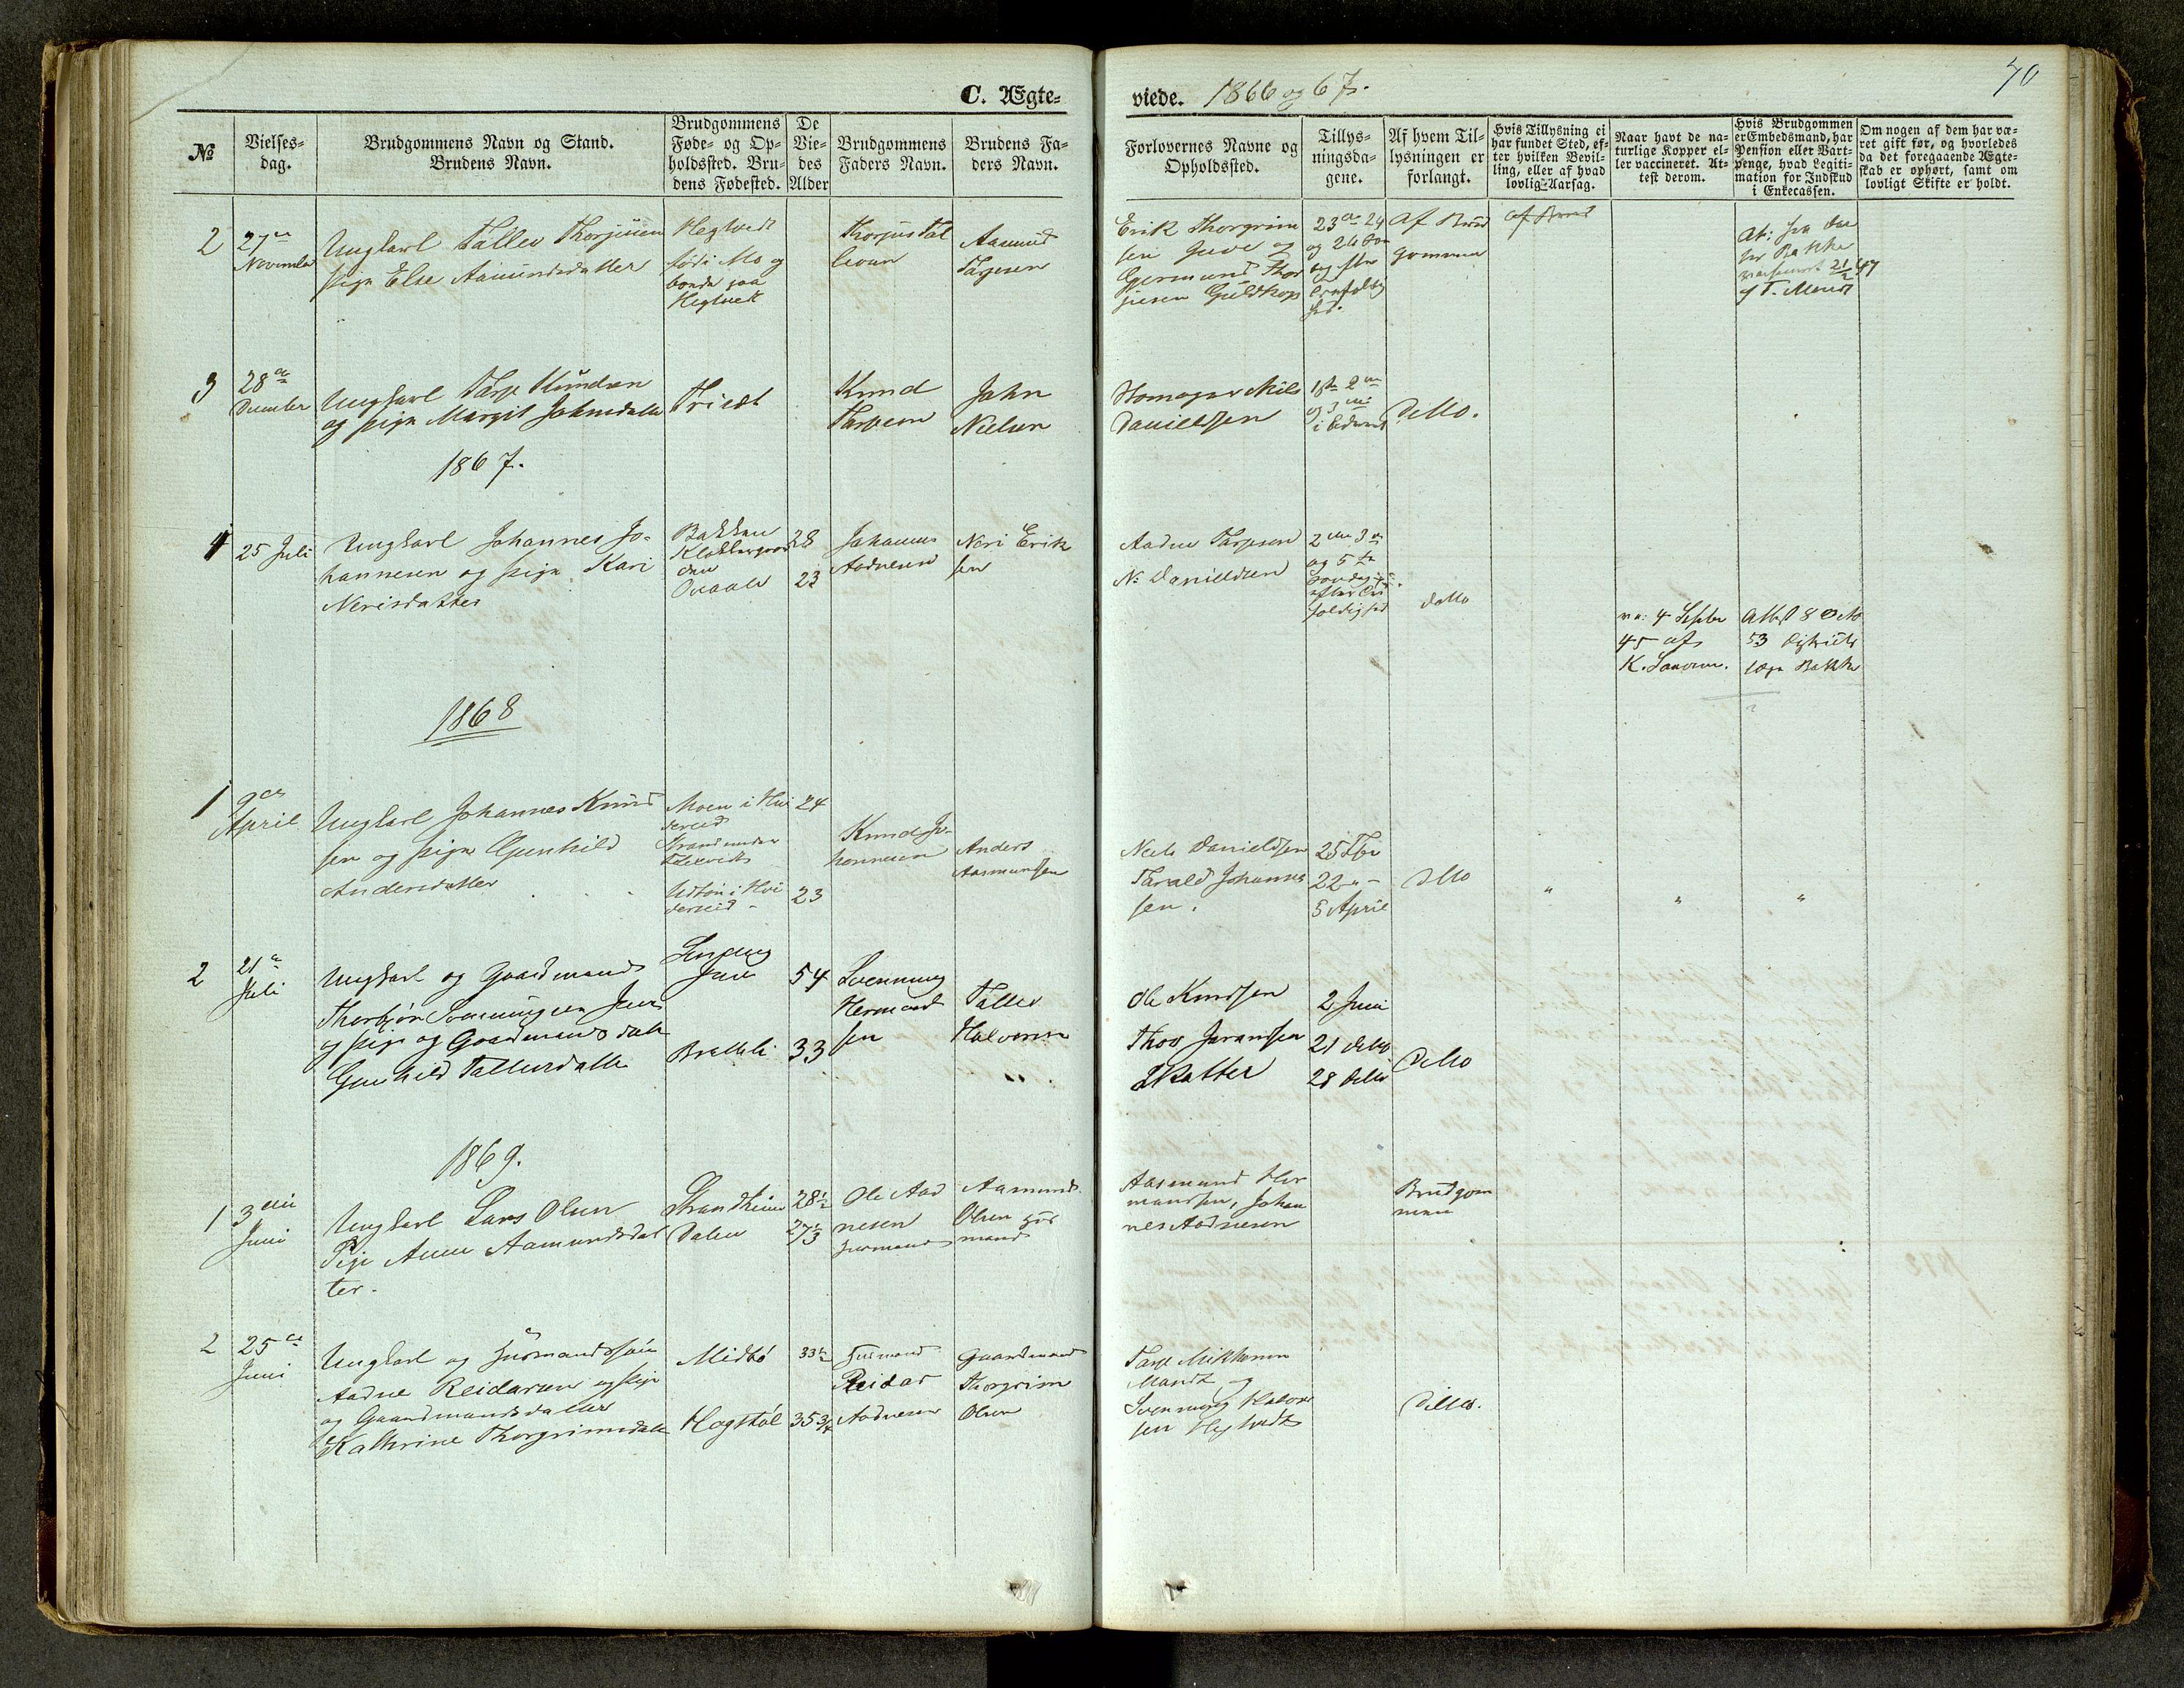 SAKO, Lårdal kirkebøker, G/Ga/L0002: Klokkerbok nr. I 2, 1861-1890, s. 70